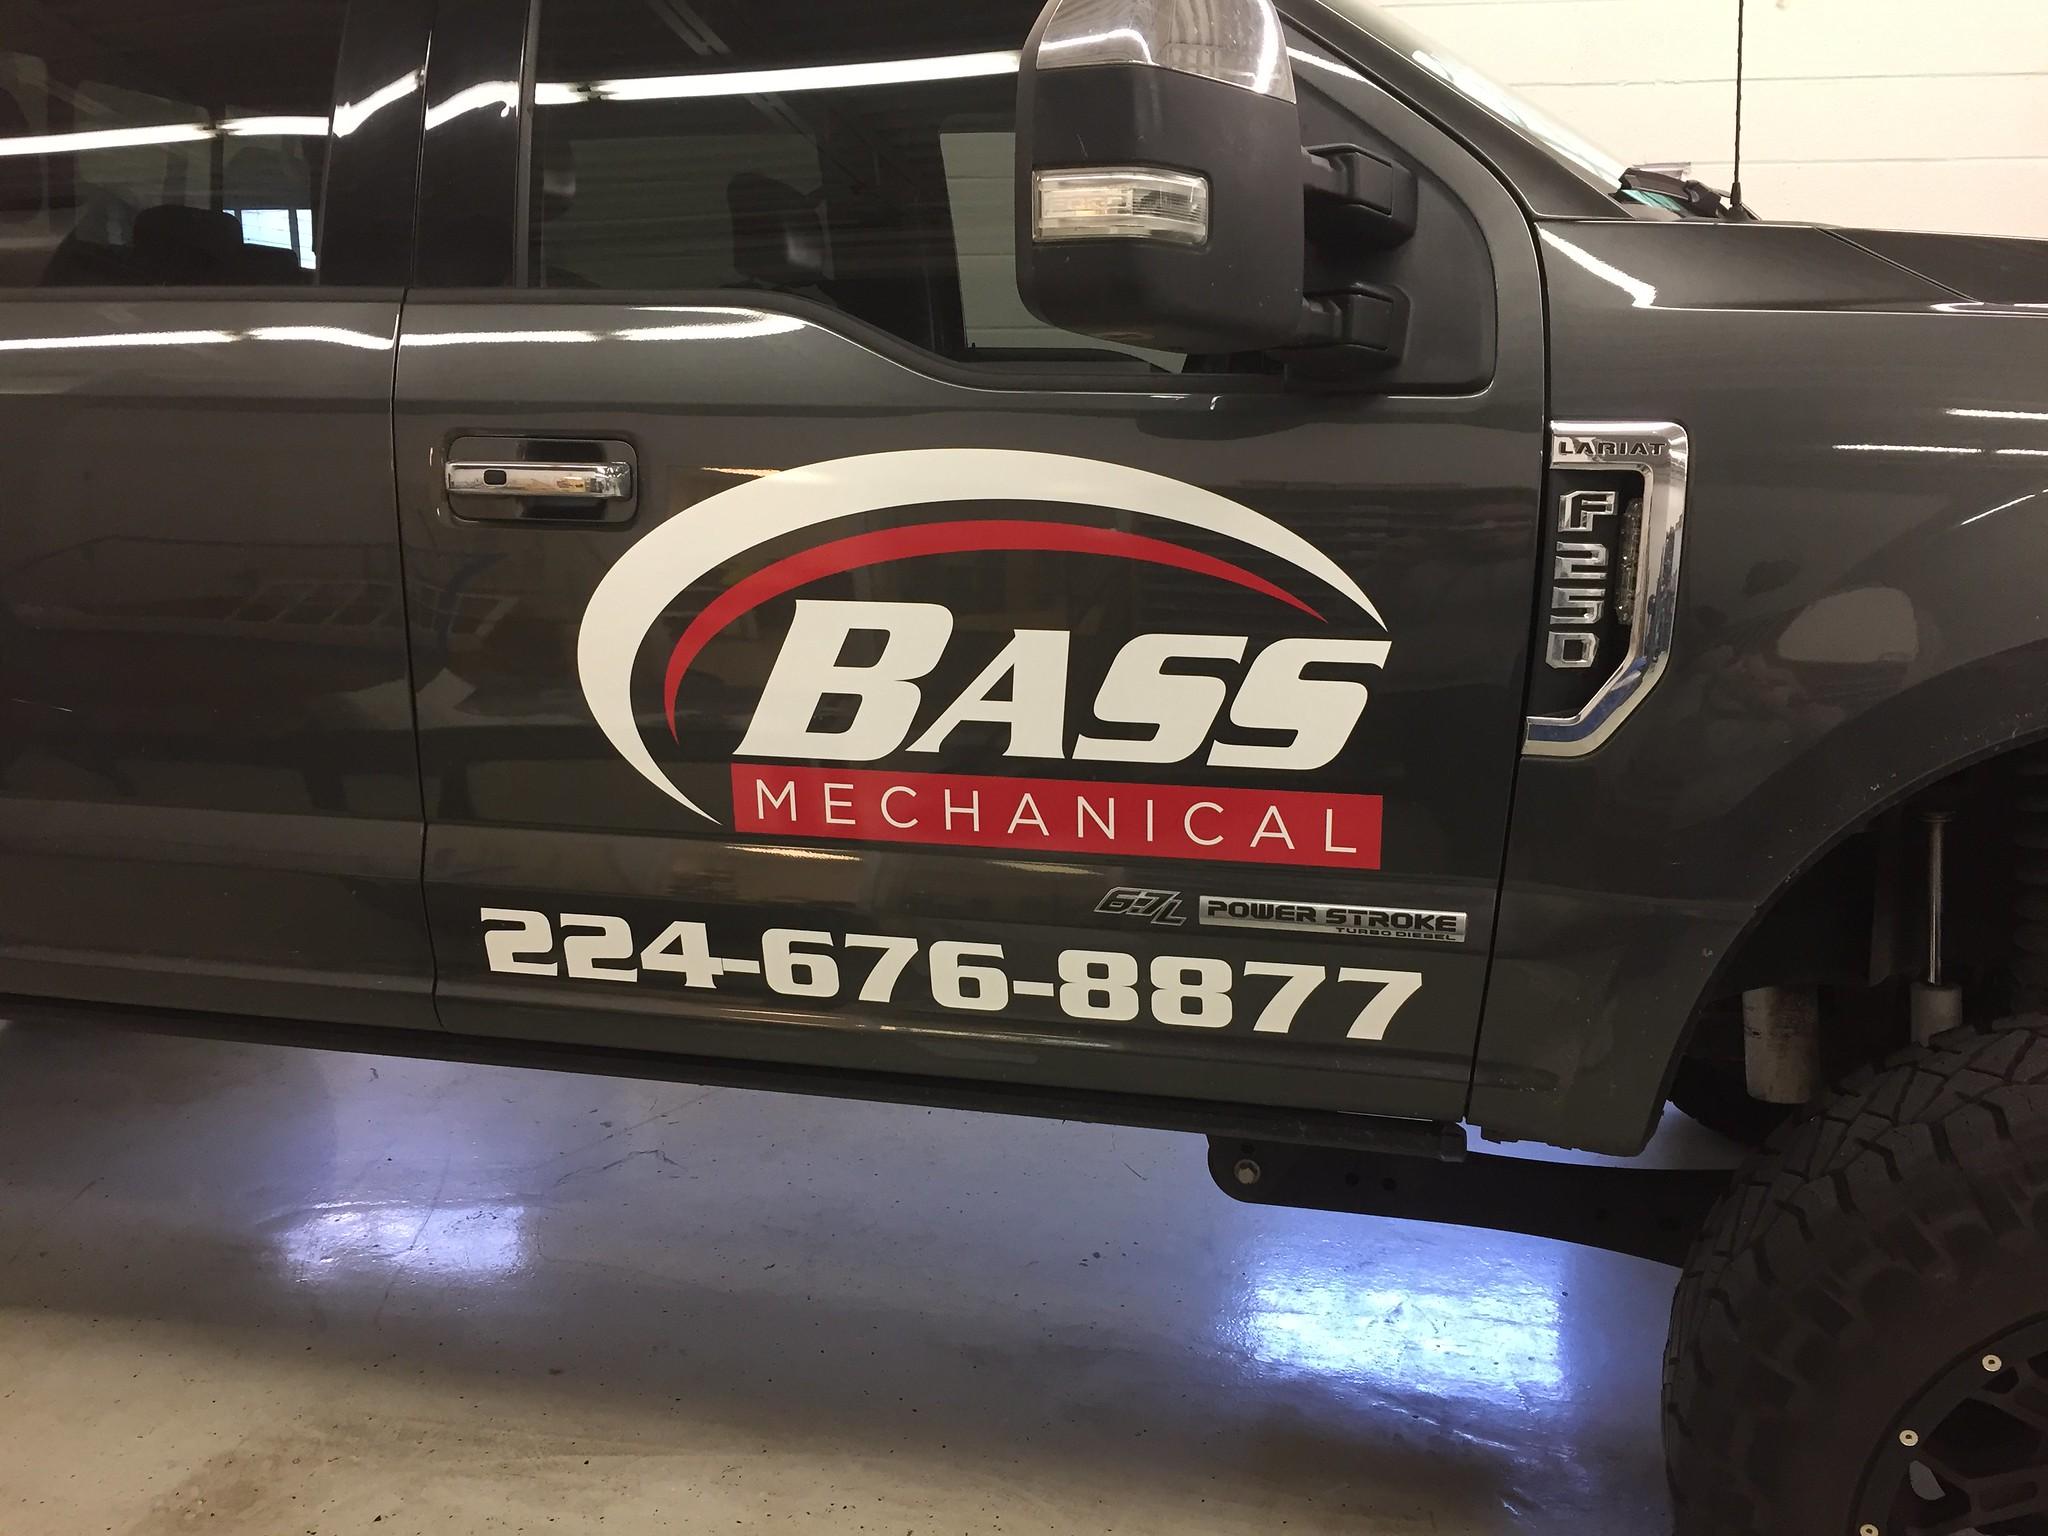 Vehicle branded graphics